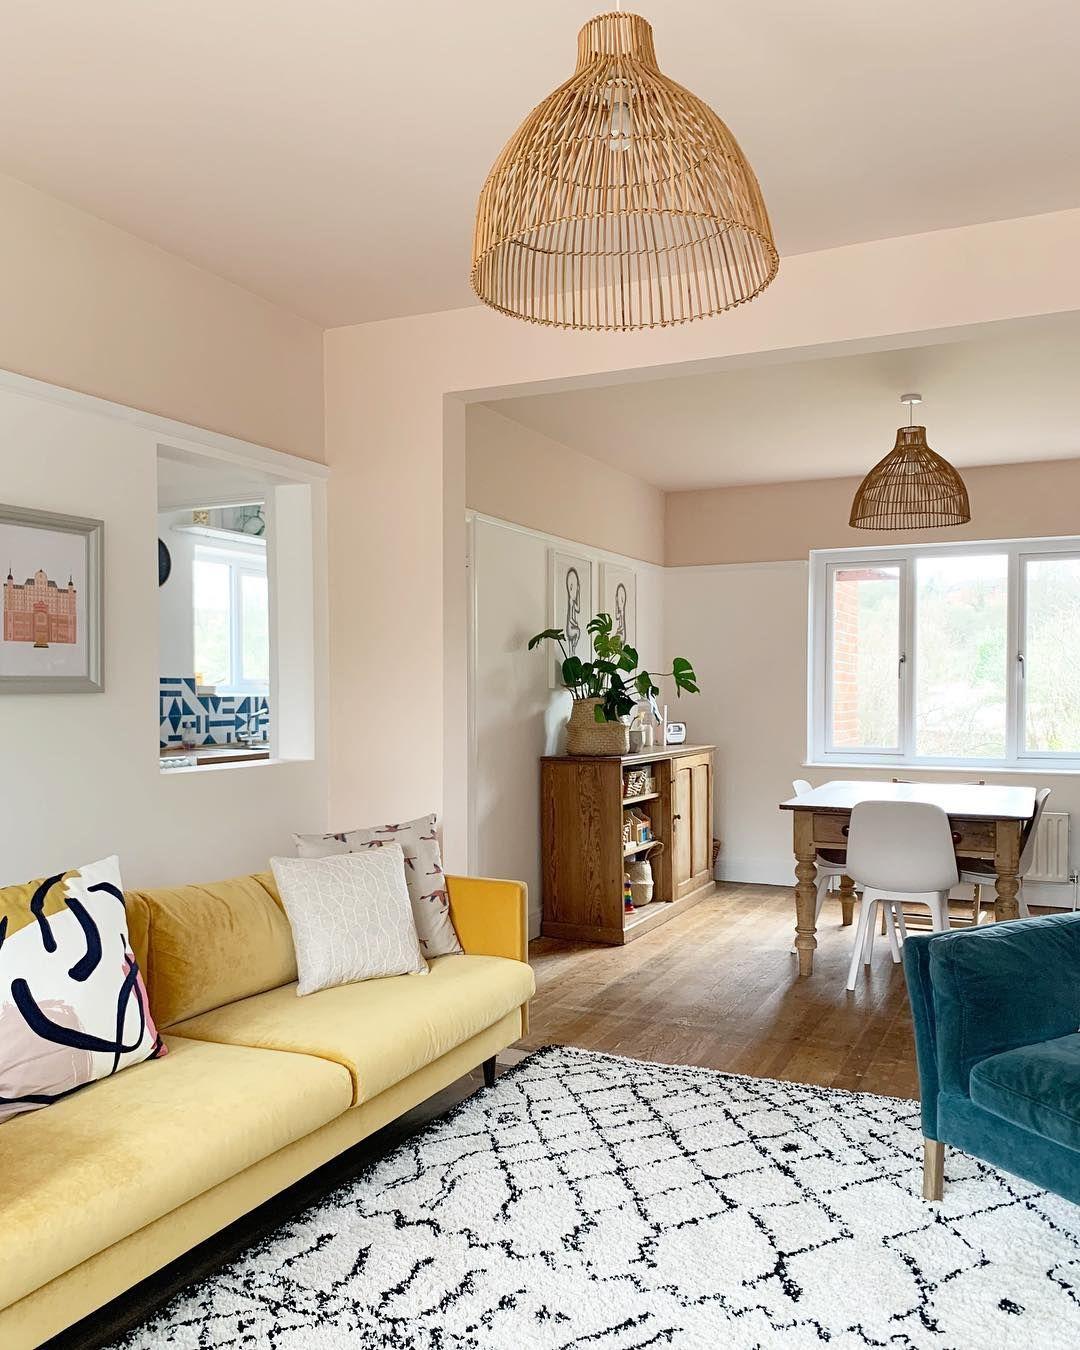 Bedroom Furniture Colors 2019